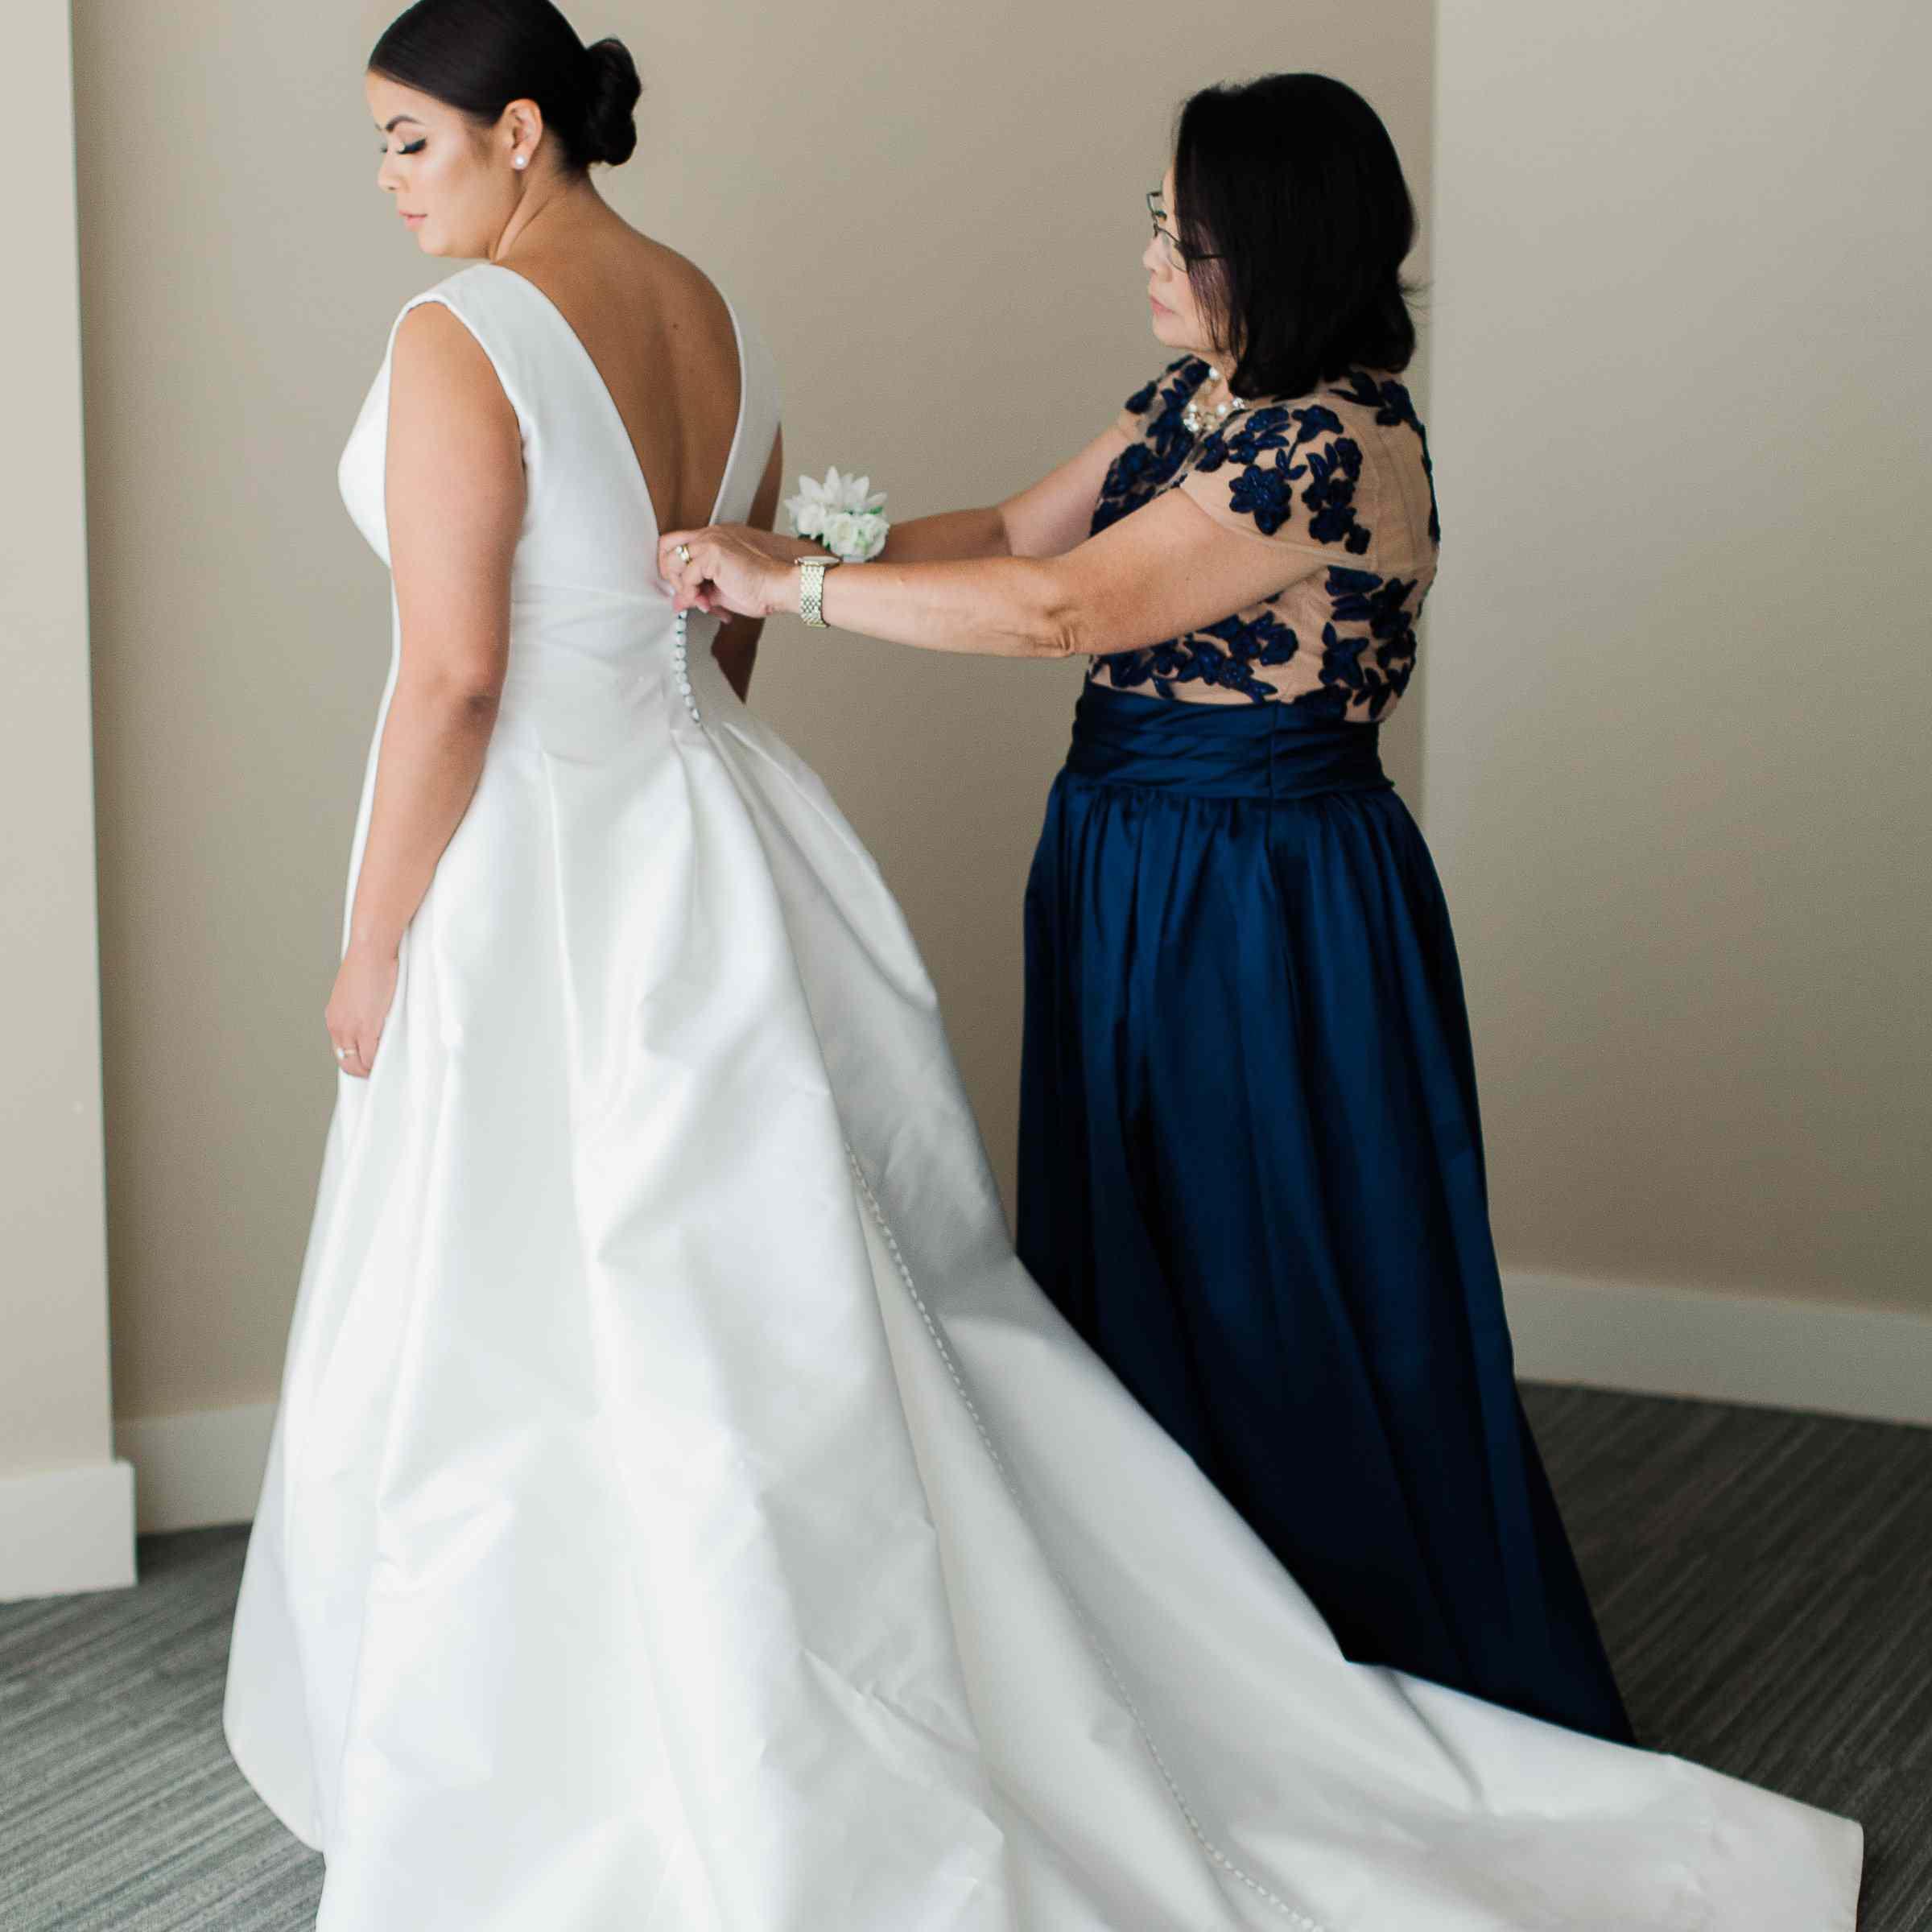 mother of bride zipping wedding dress